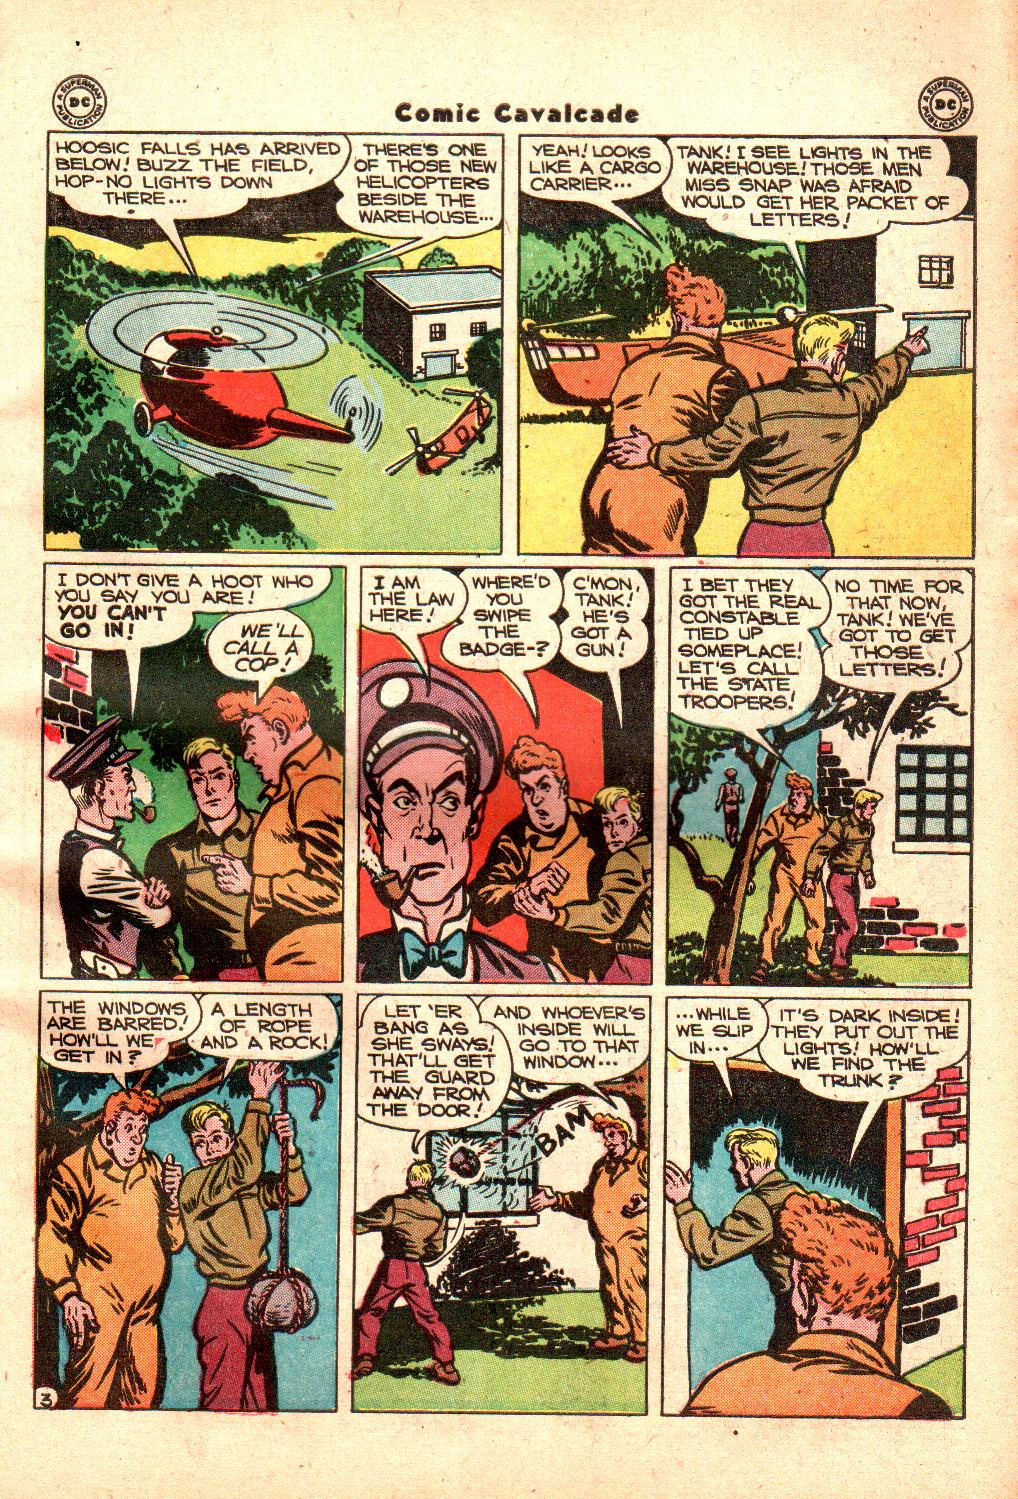 Comic Cavalcade issue 21 - Page 45